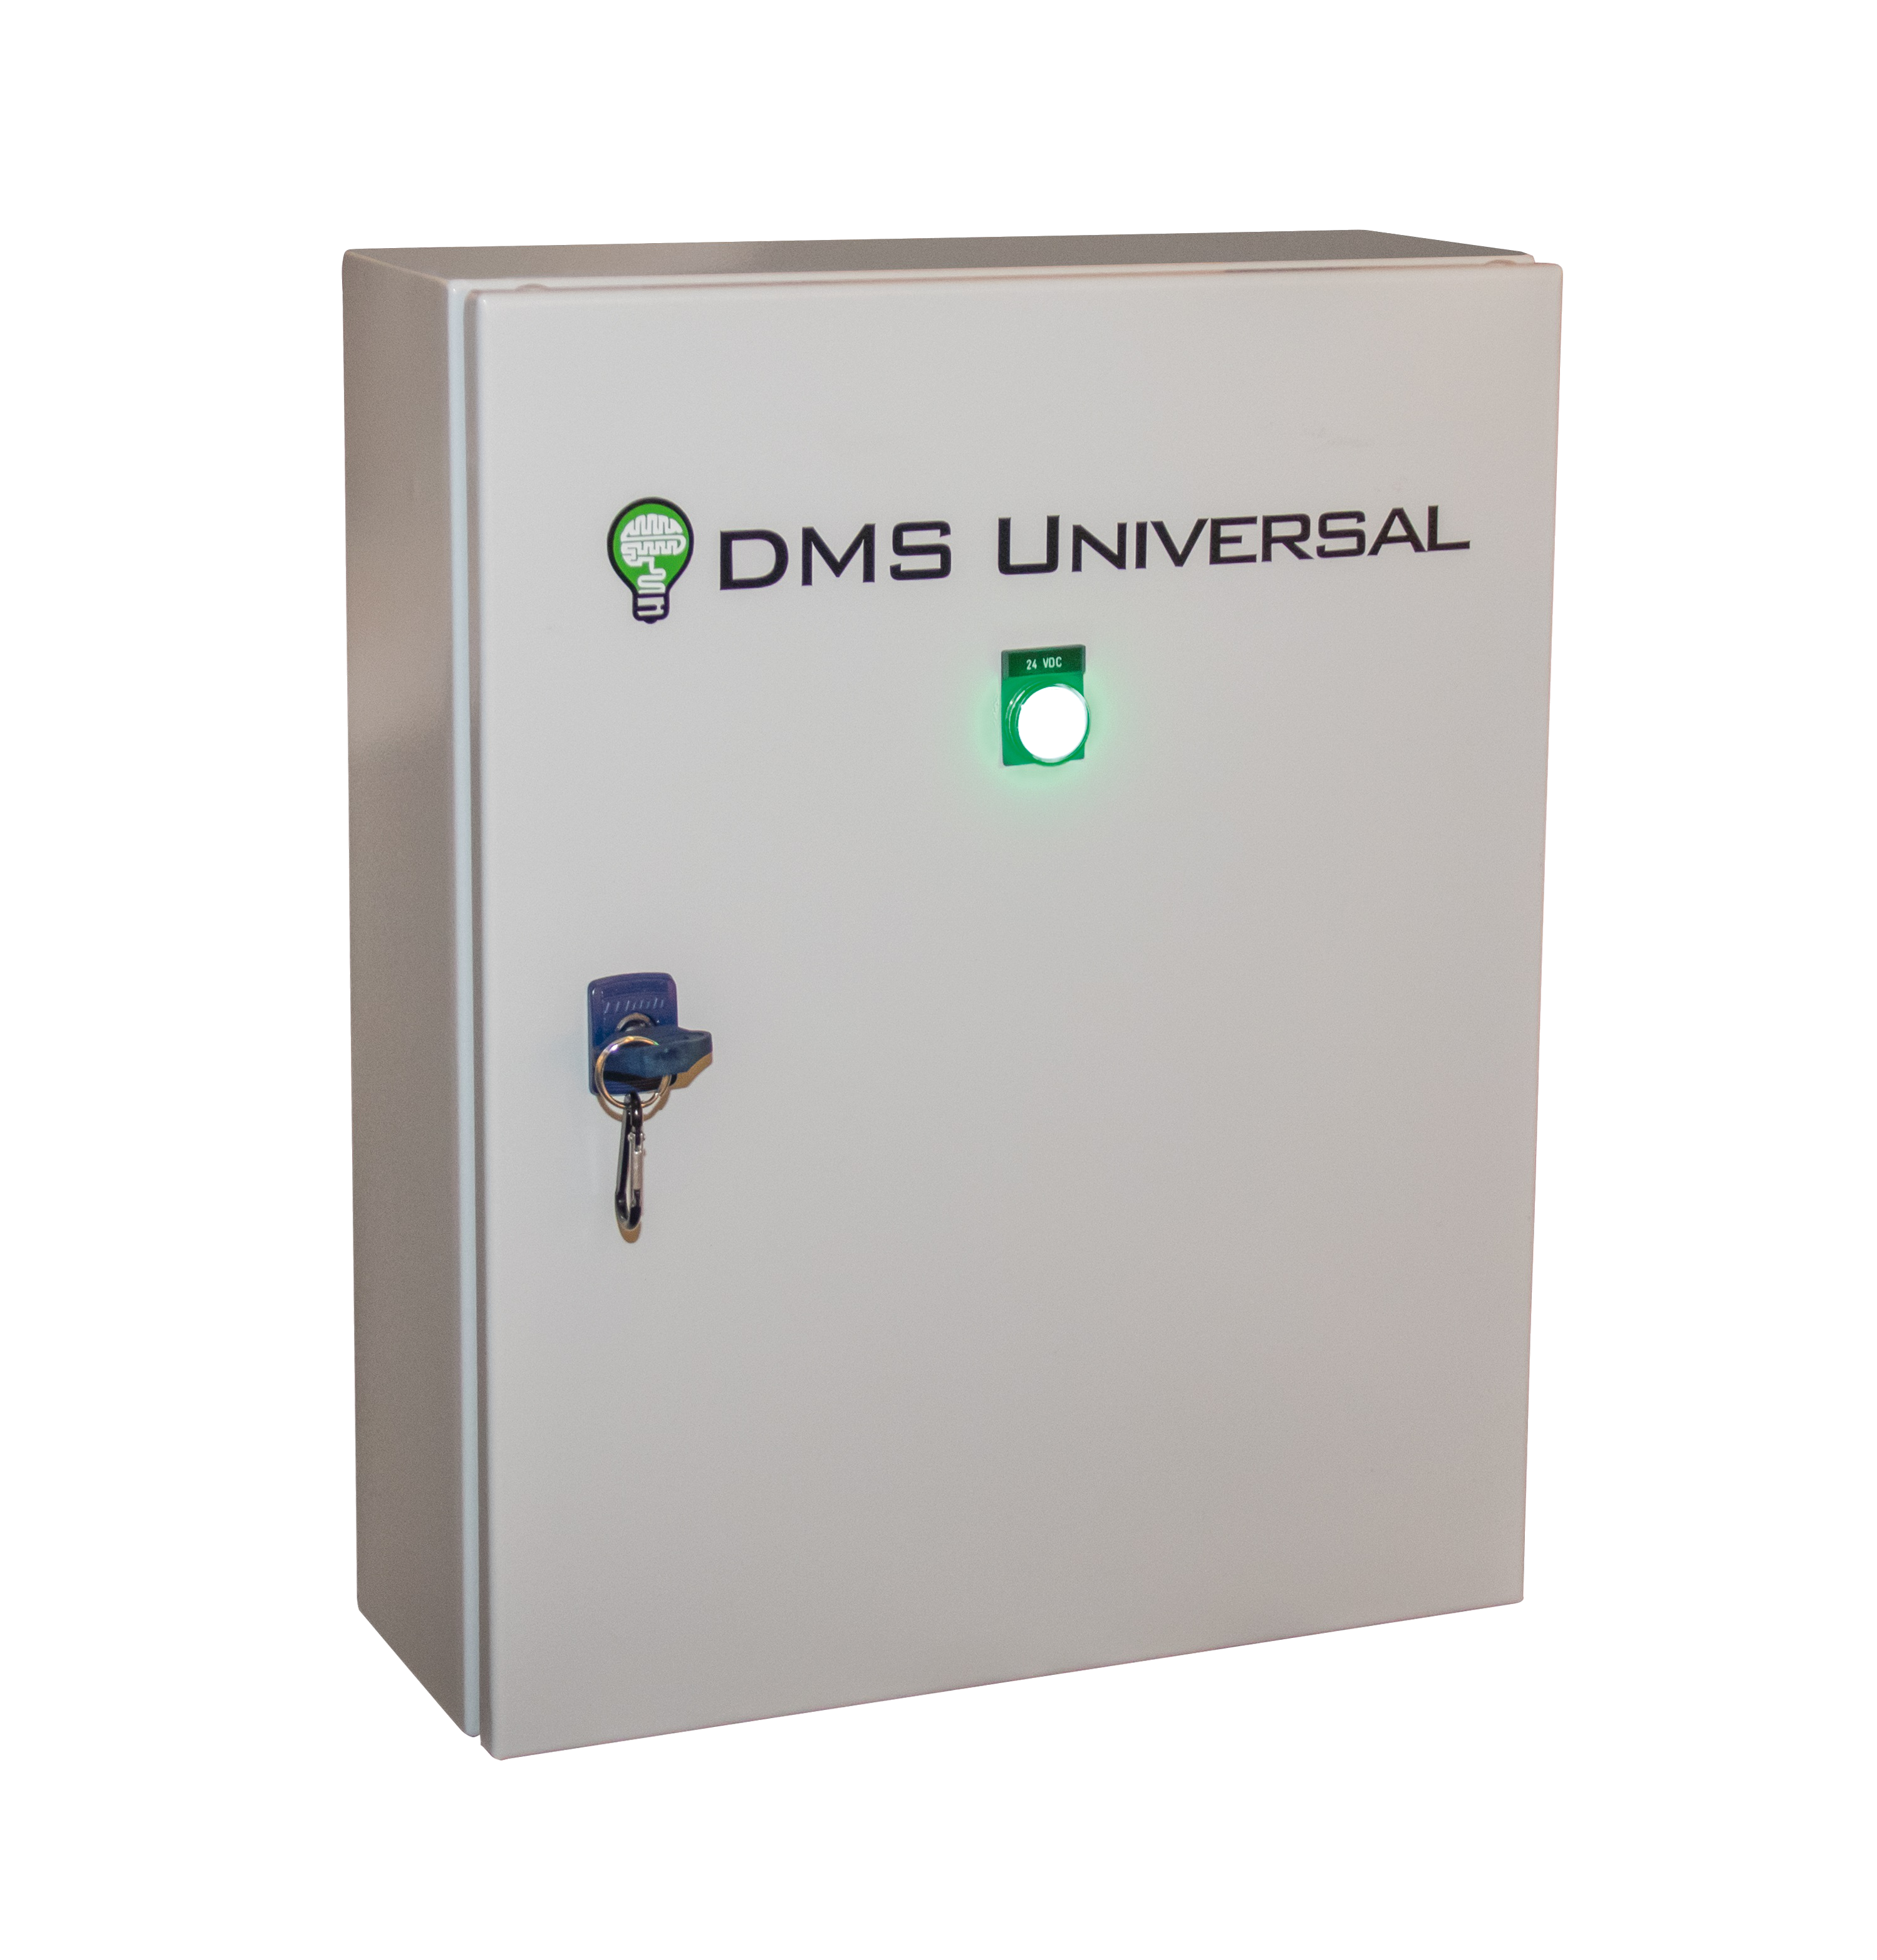 DMS Universal box